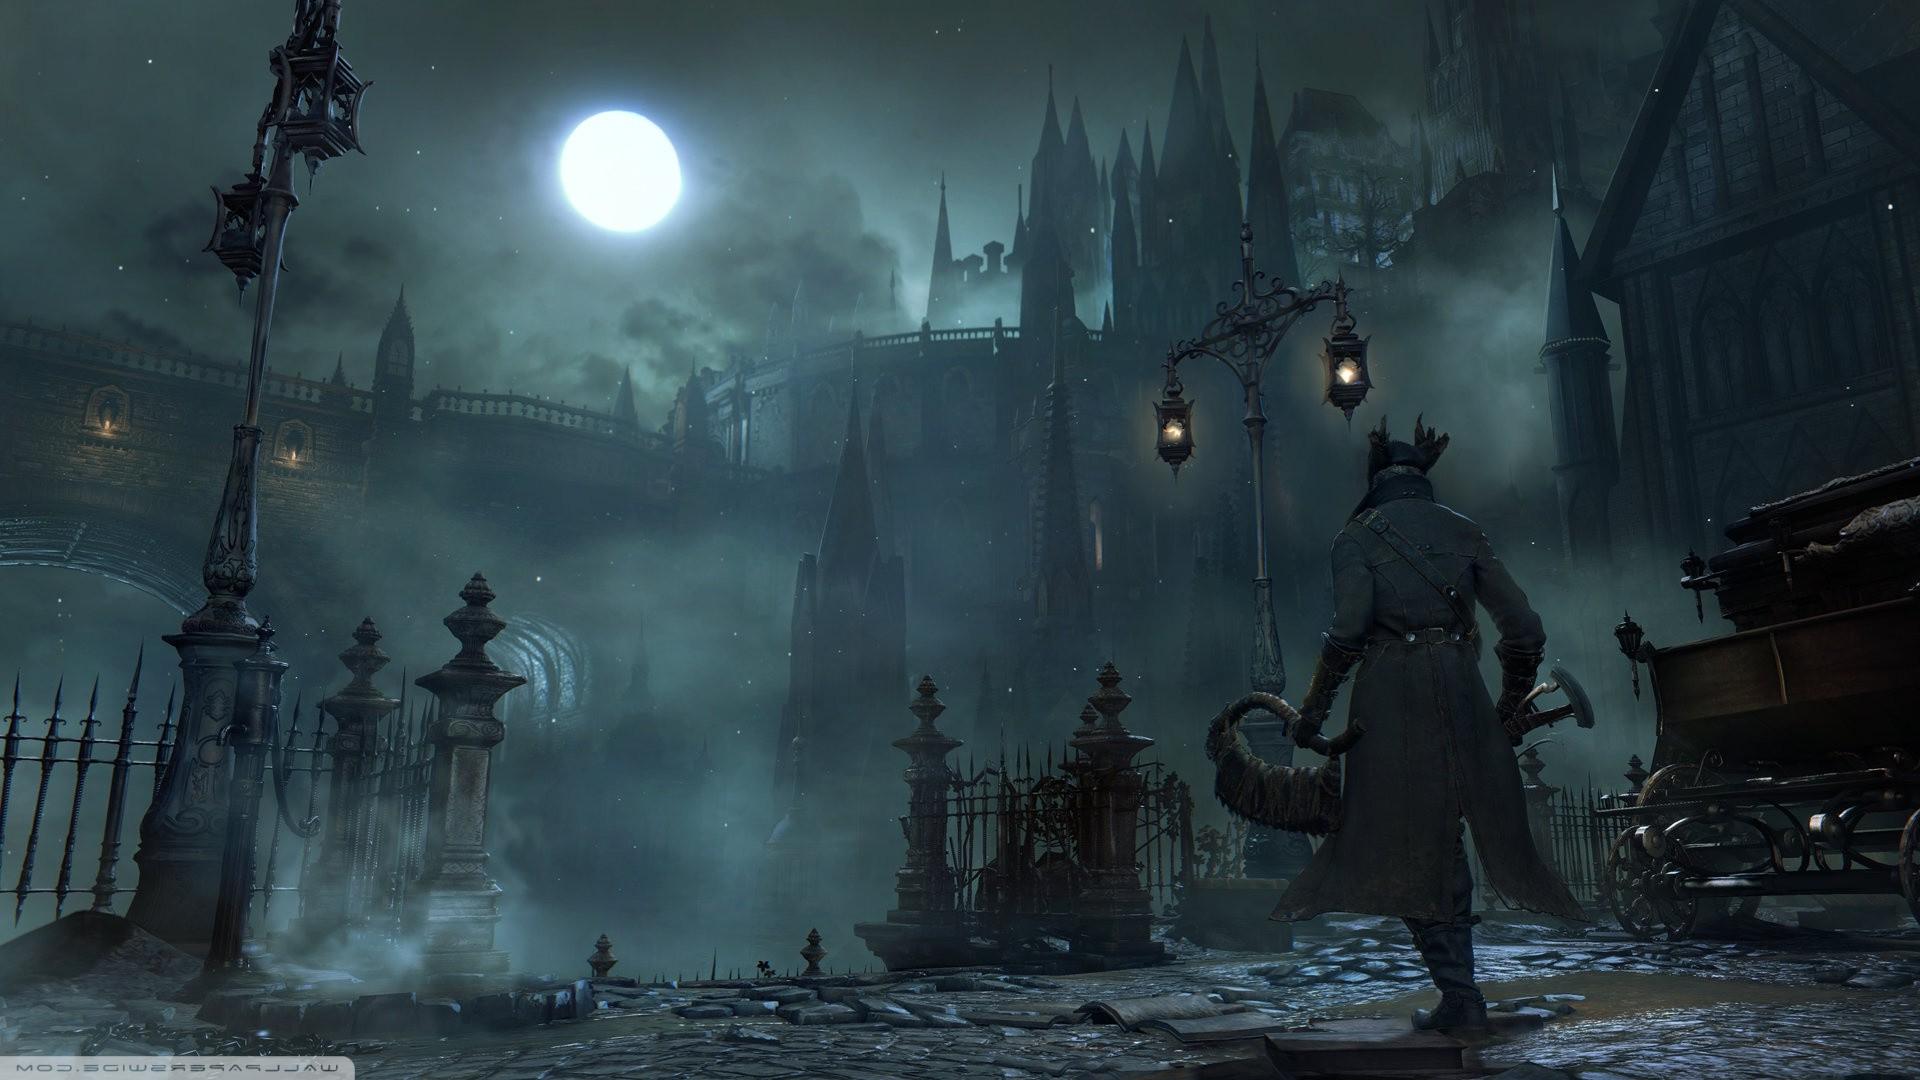 Wallpaper Video Games Bloodborne Midnight Ghost Ship